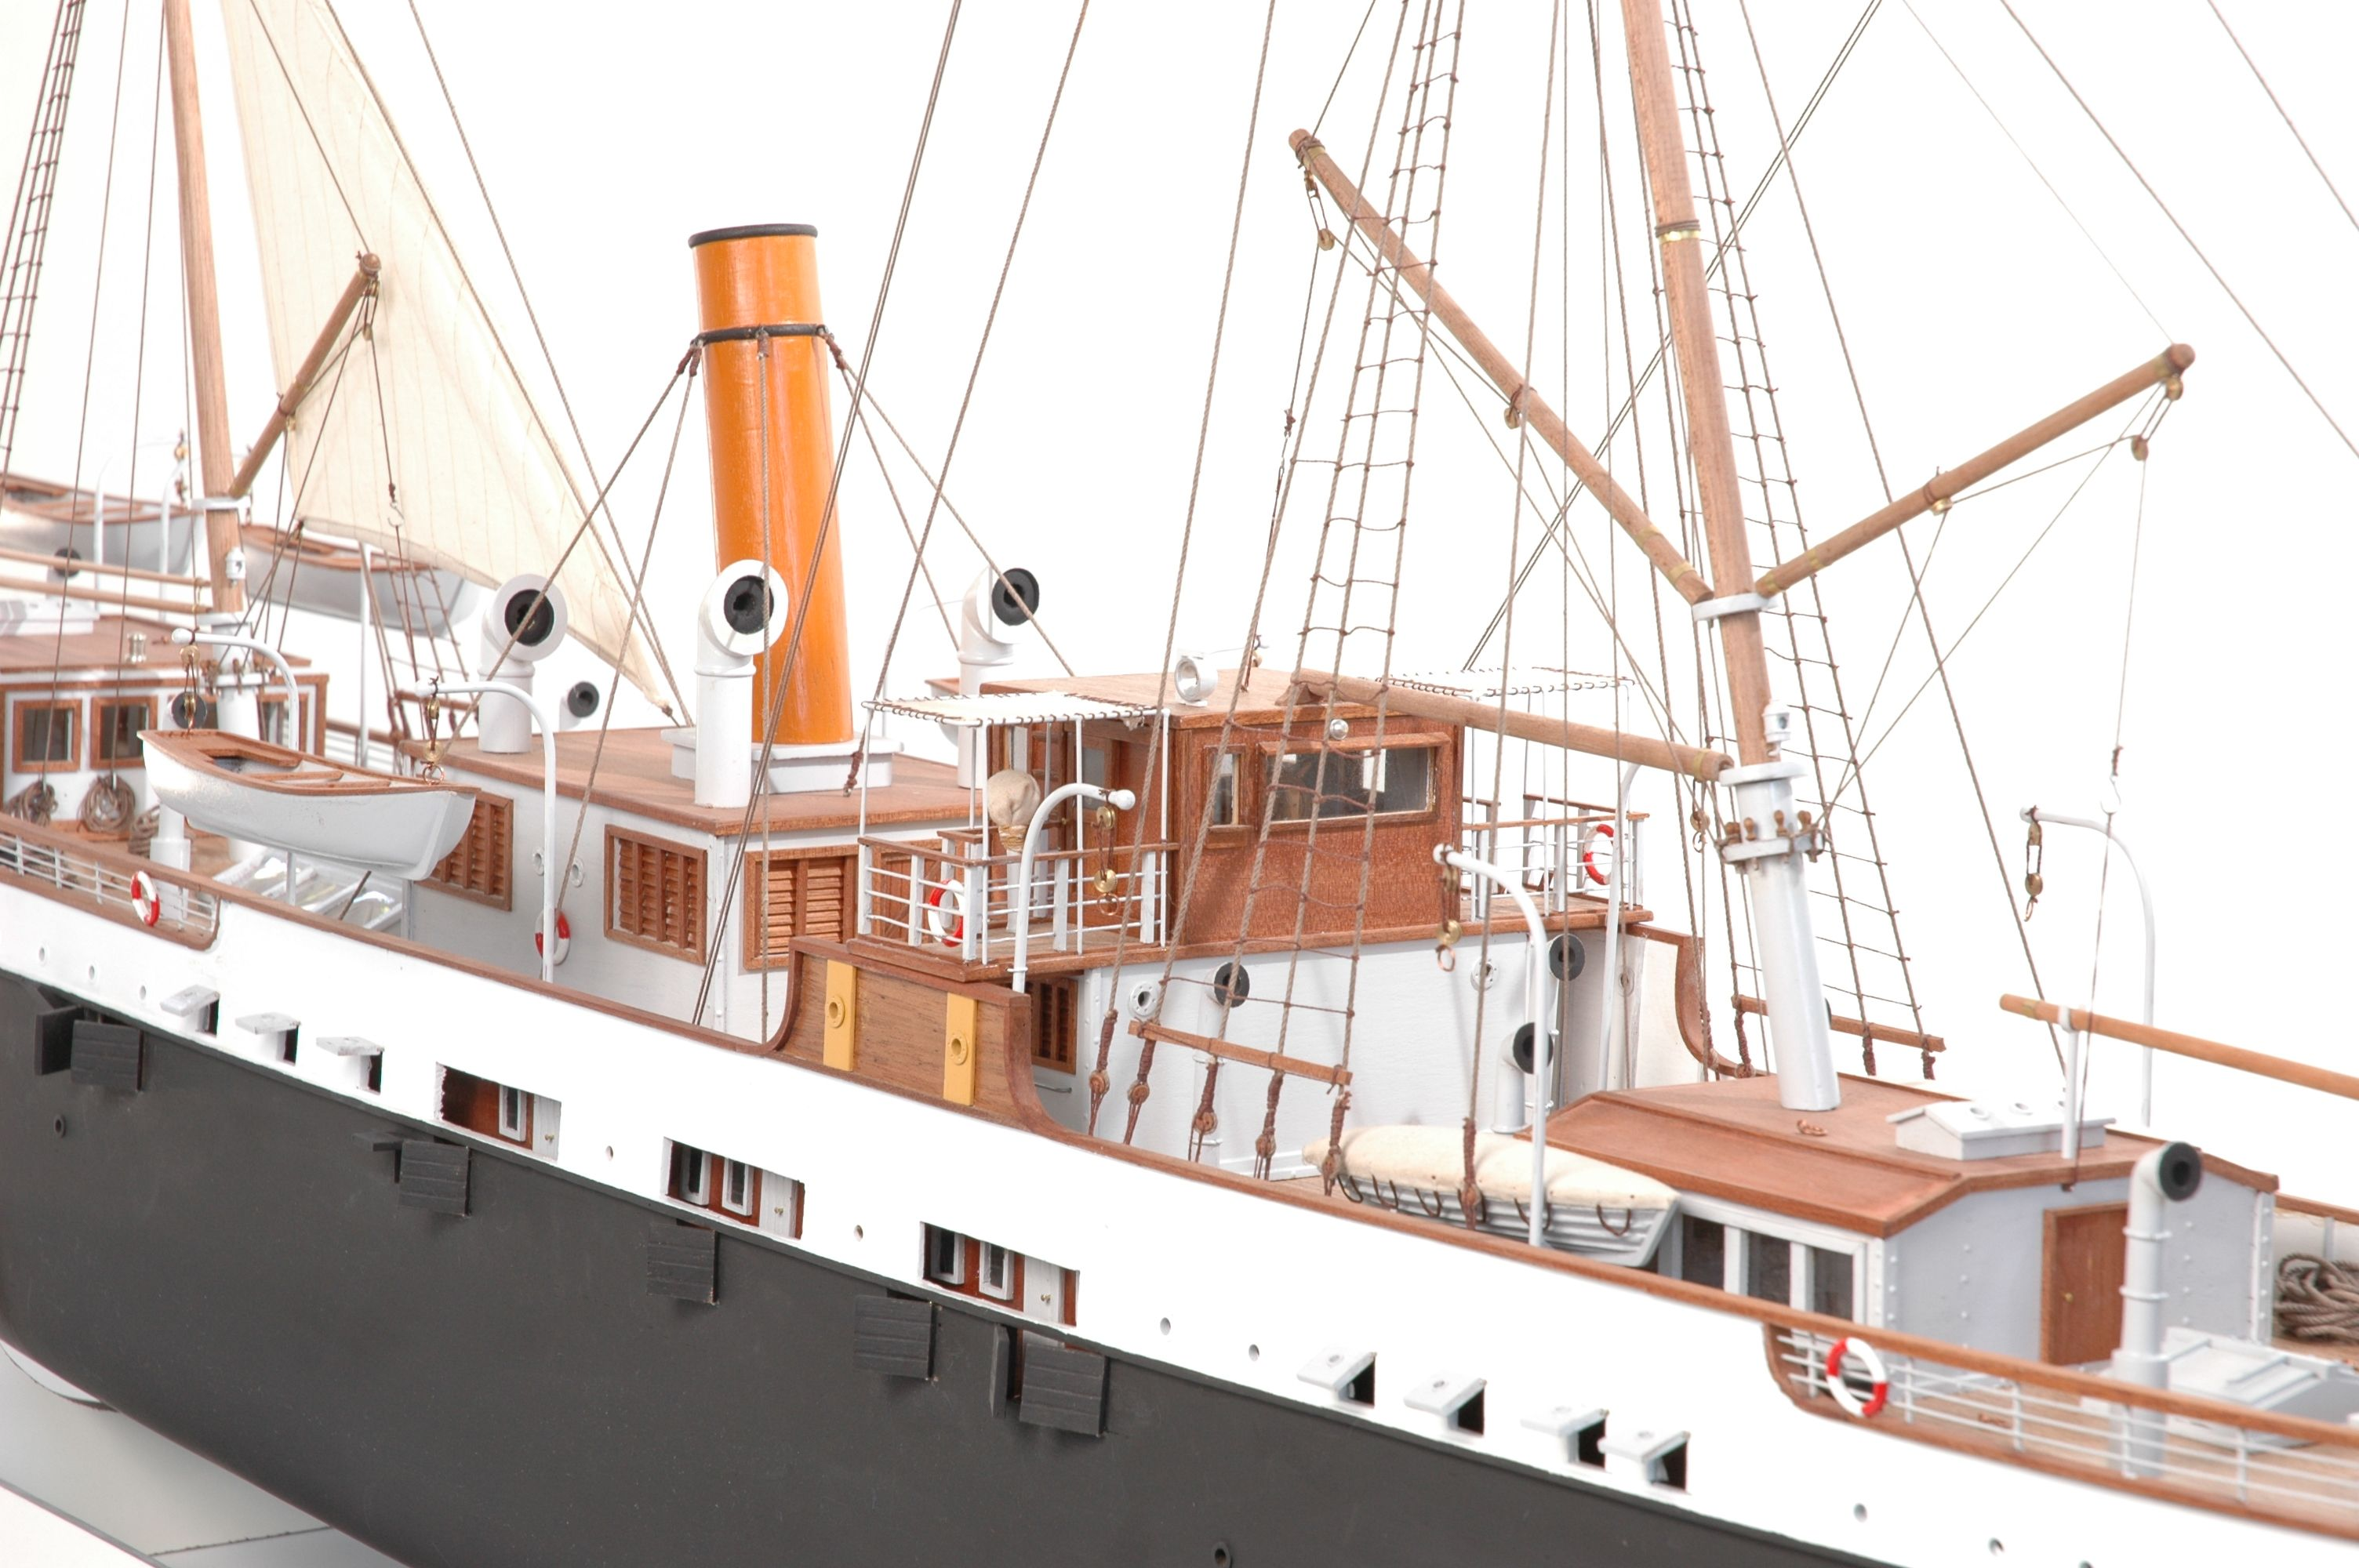 1416-6317-G-G-Loudon-Ship-Model-large-Premier-Range